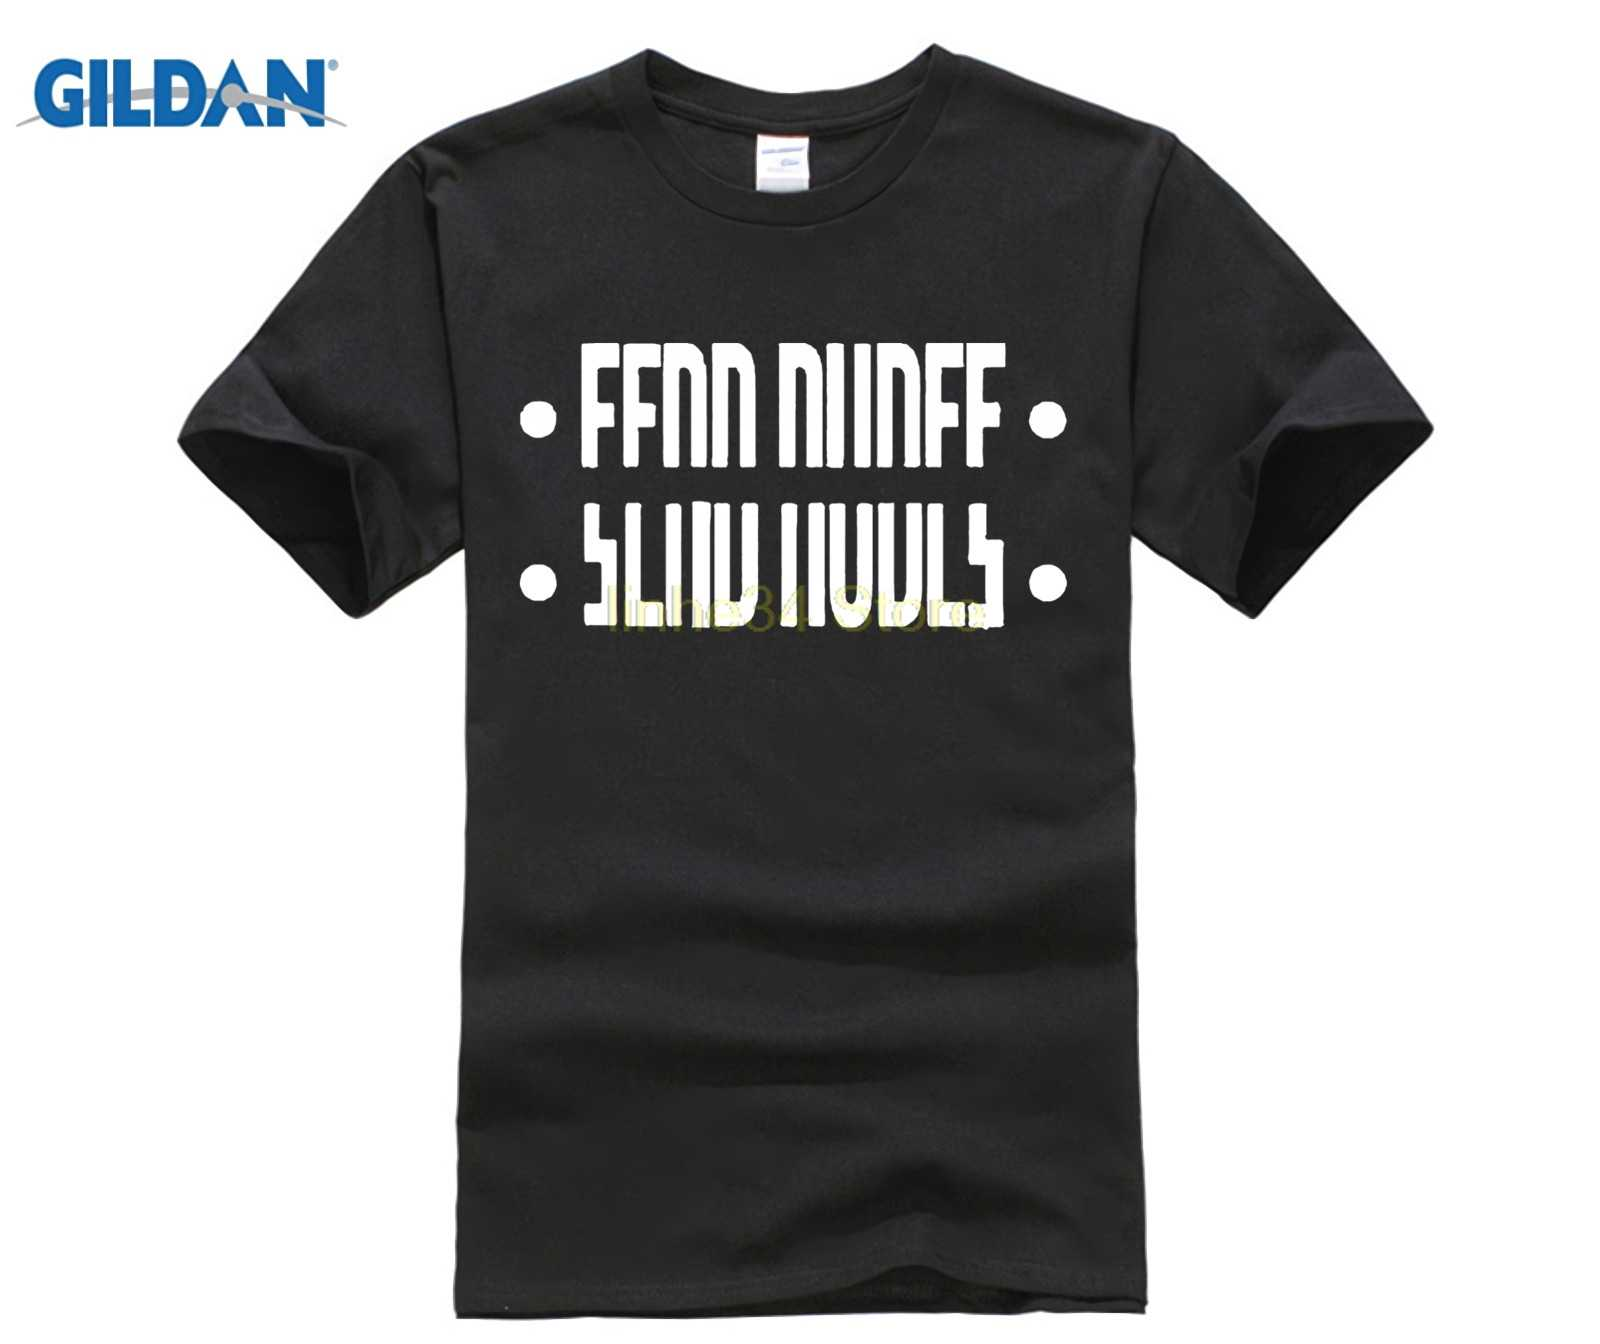 37ea0dc15790 ... Send Nudes - T-Shirt Black Hidden Message Humor Funny Meme All Sizes S-  ...